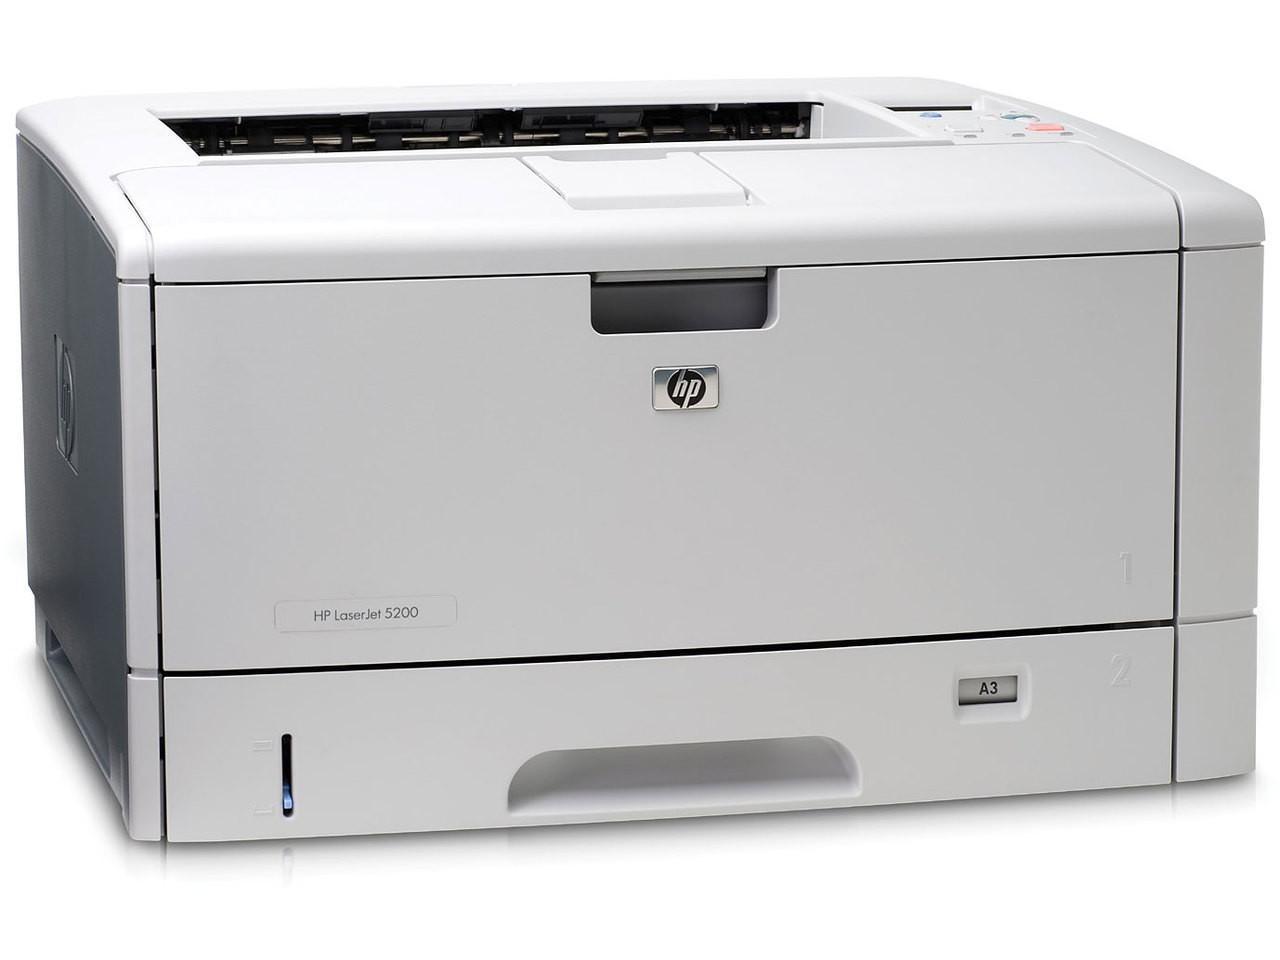 HP LaserJet 5200 - Q7543A - HP 11x17 Laser Printer for sale